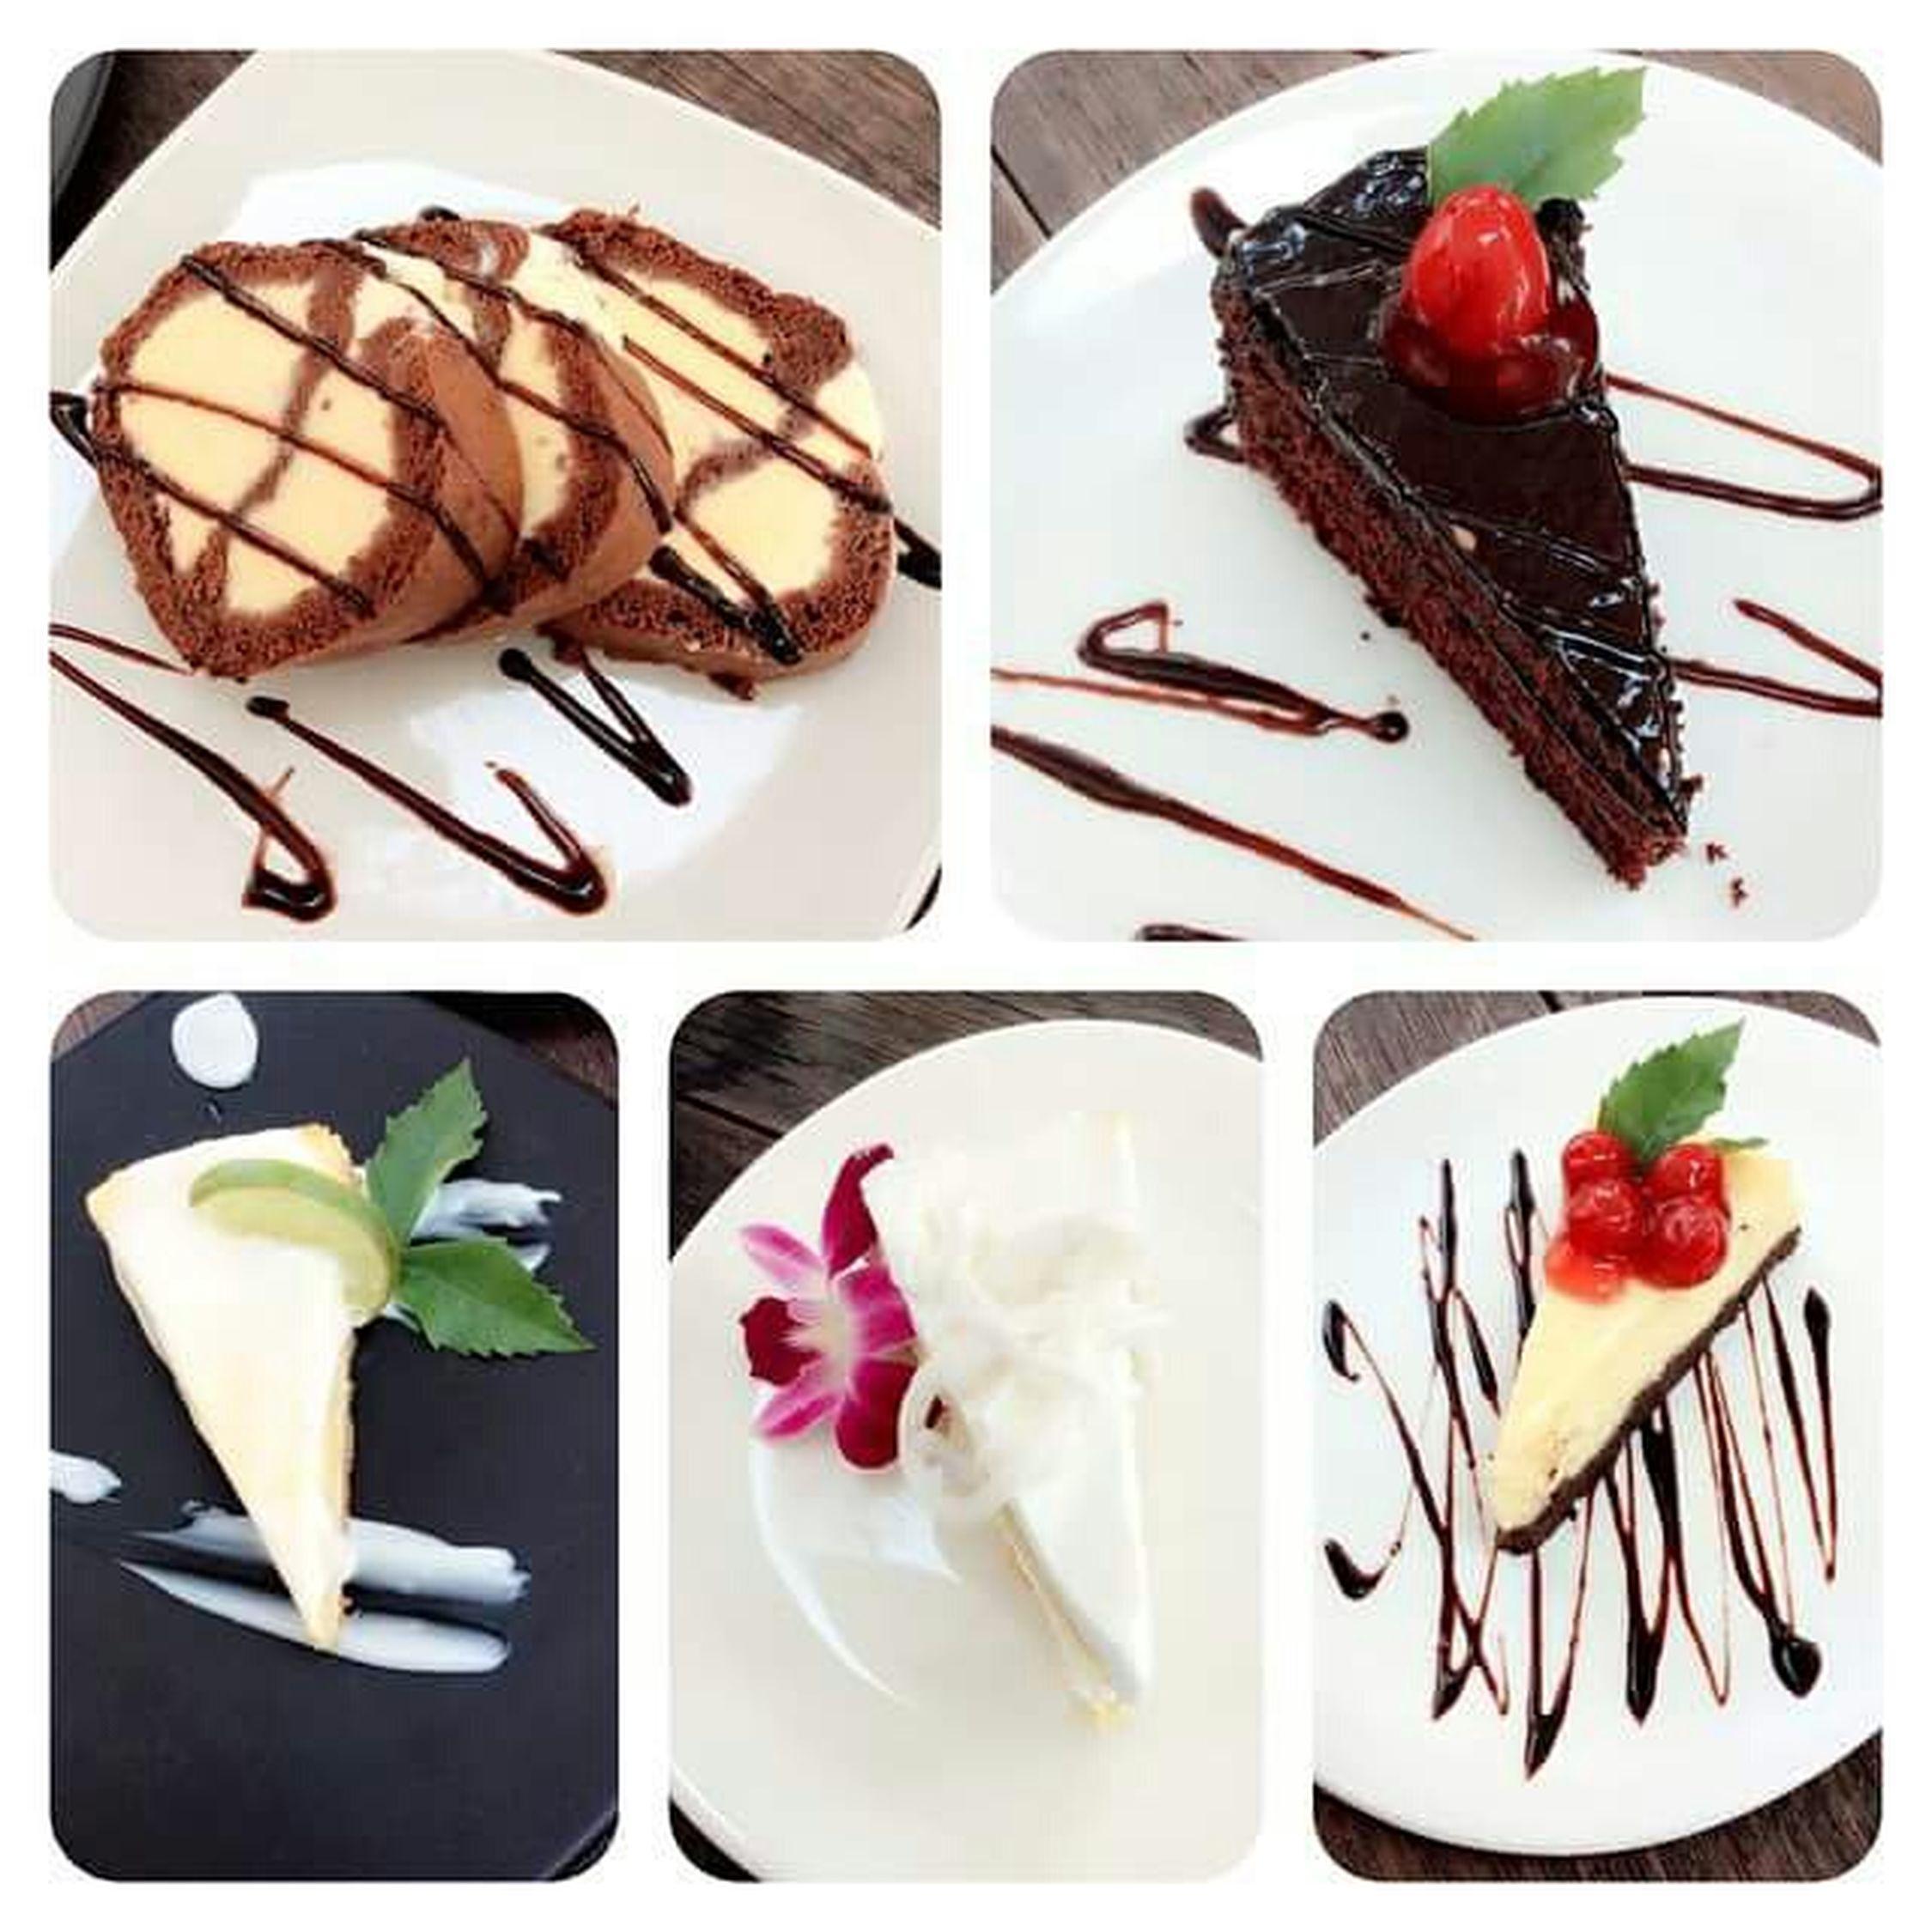 It's very delicious. อร่อยนะ ไปลอง At บ้านใกล้วัง (Baan Khrai Wang) Huahin Food Traveling Delicious Cake  Cake Delicious Trip Goodtrip GoodTimes